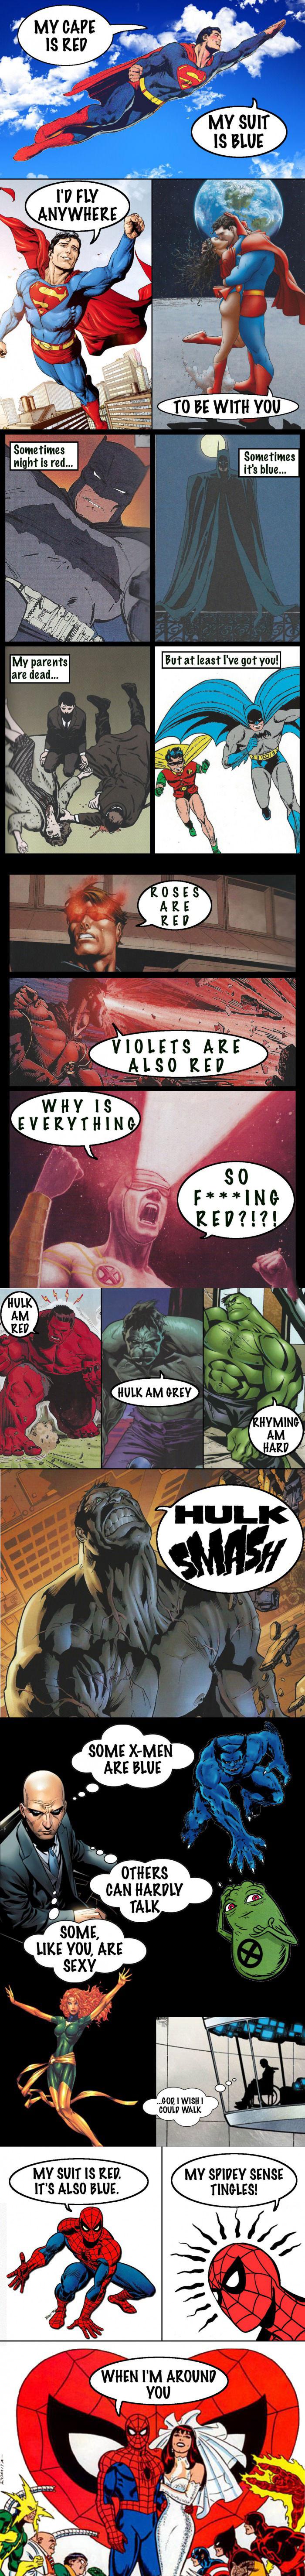 superhero valentine poetry, lol, marvel comics